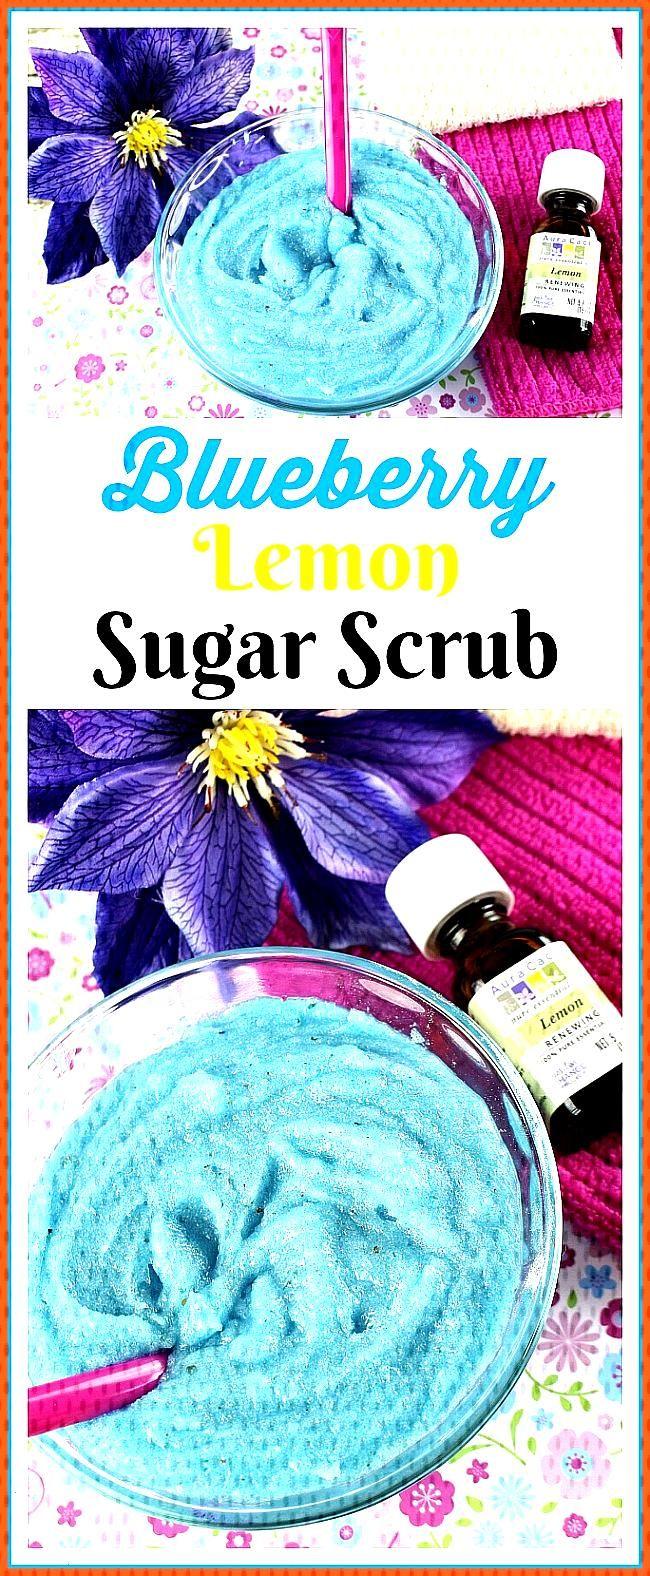 Blueberry Lemon Sugar Scrub- Refreshing DIY Beauty Product Blueberry Lemon Sugar Scrub- You don t h